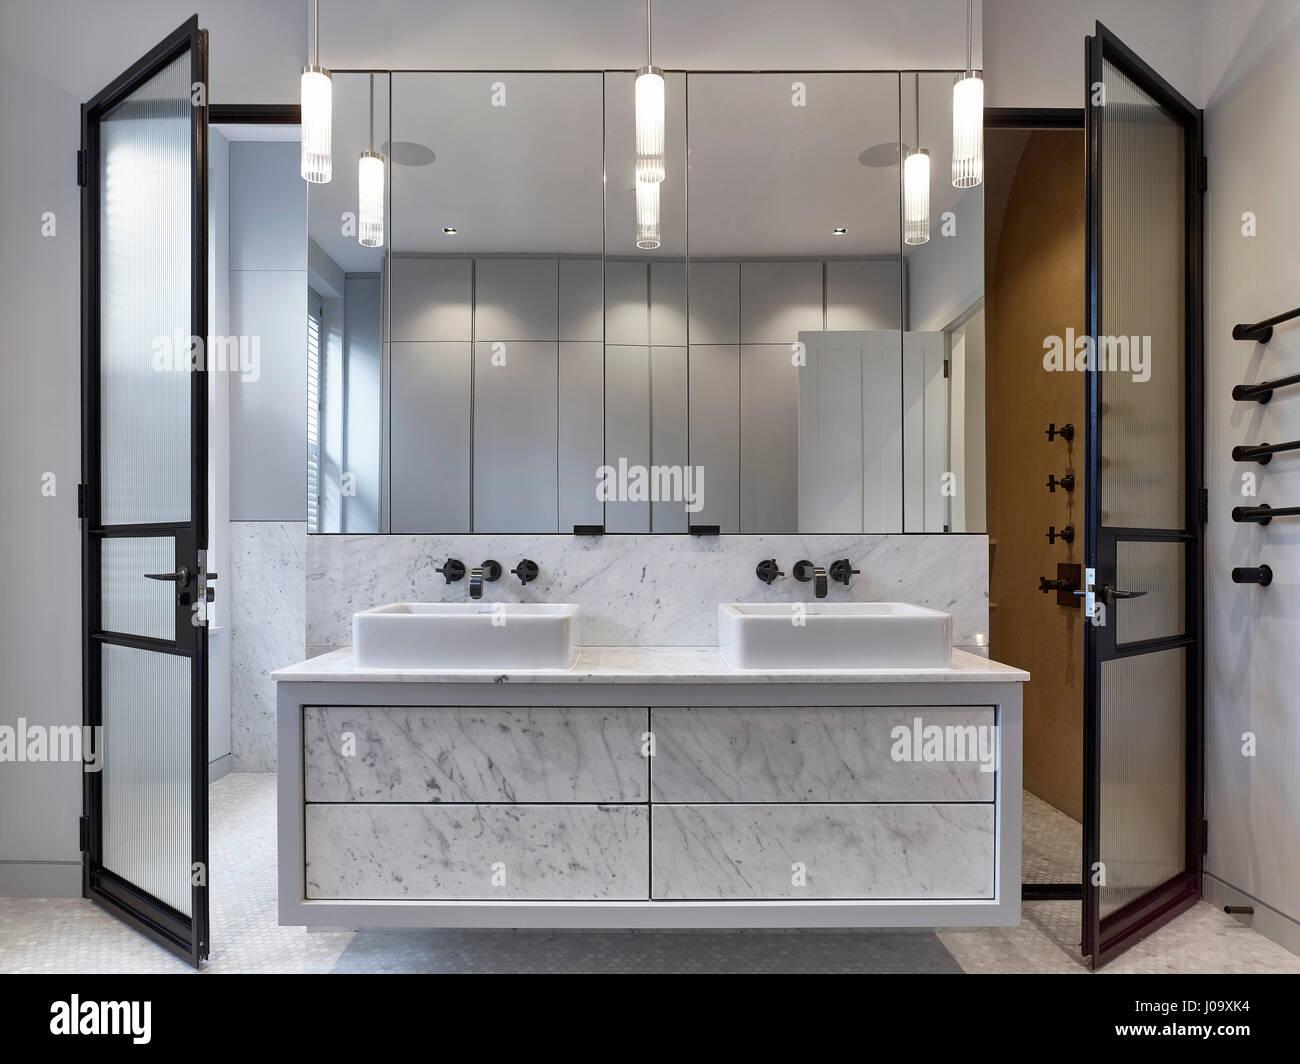 Bathroom. Hampstead Ponds House, London, United Kingdom. Architect: Stiff + Trevillion Architects, 2016. - Stock Image